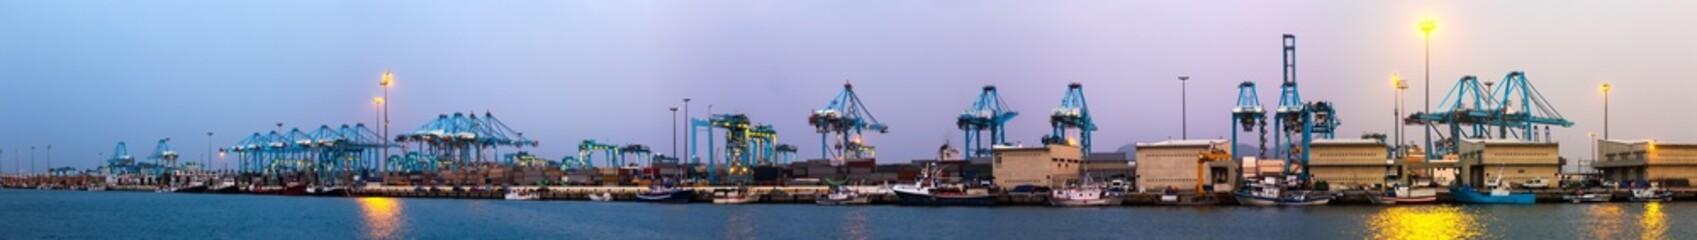 Evening view of  Port of Algeciras